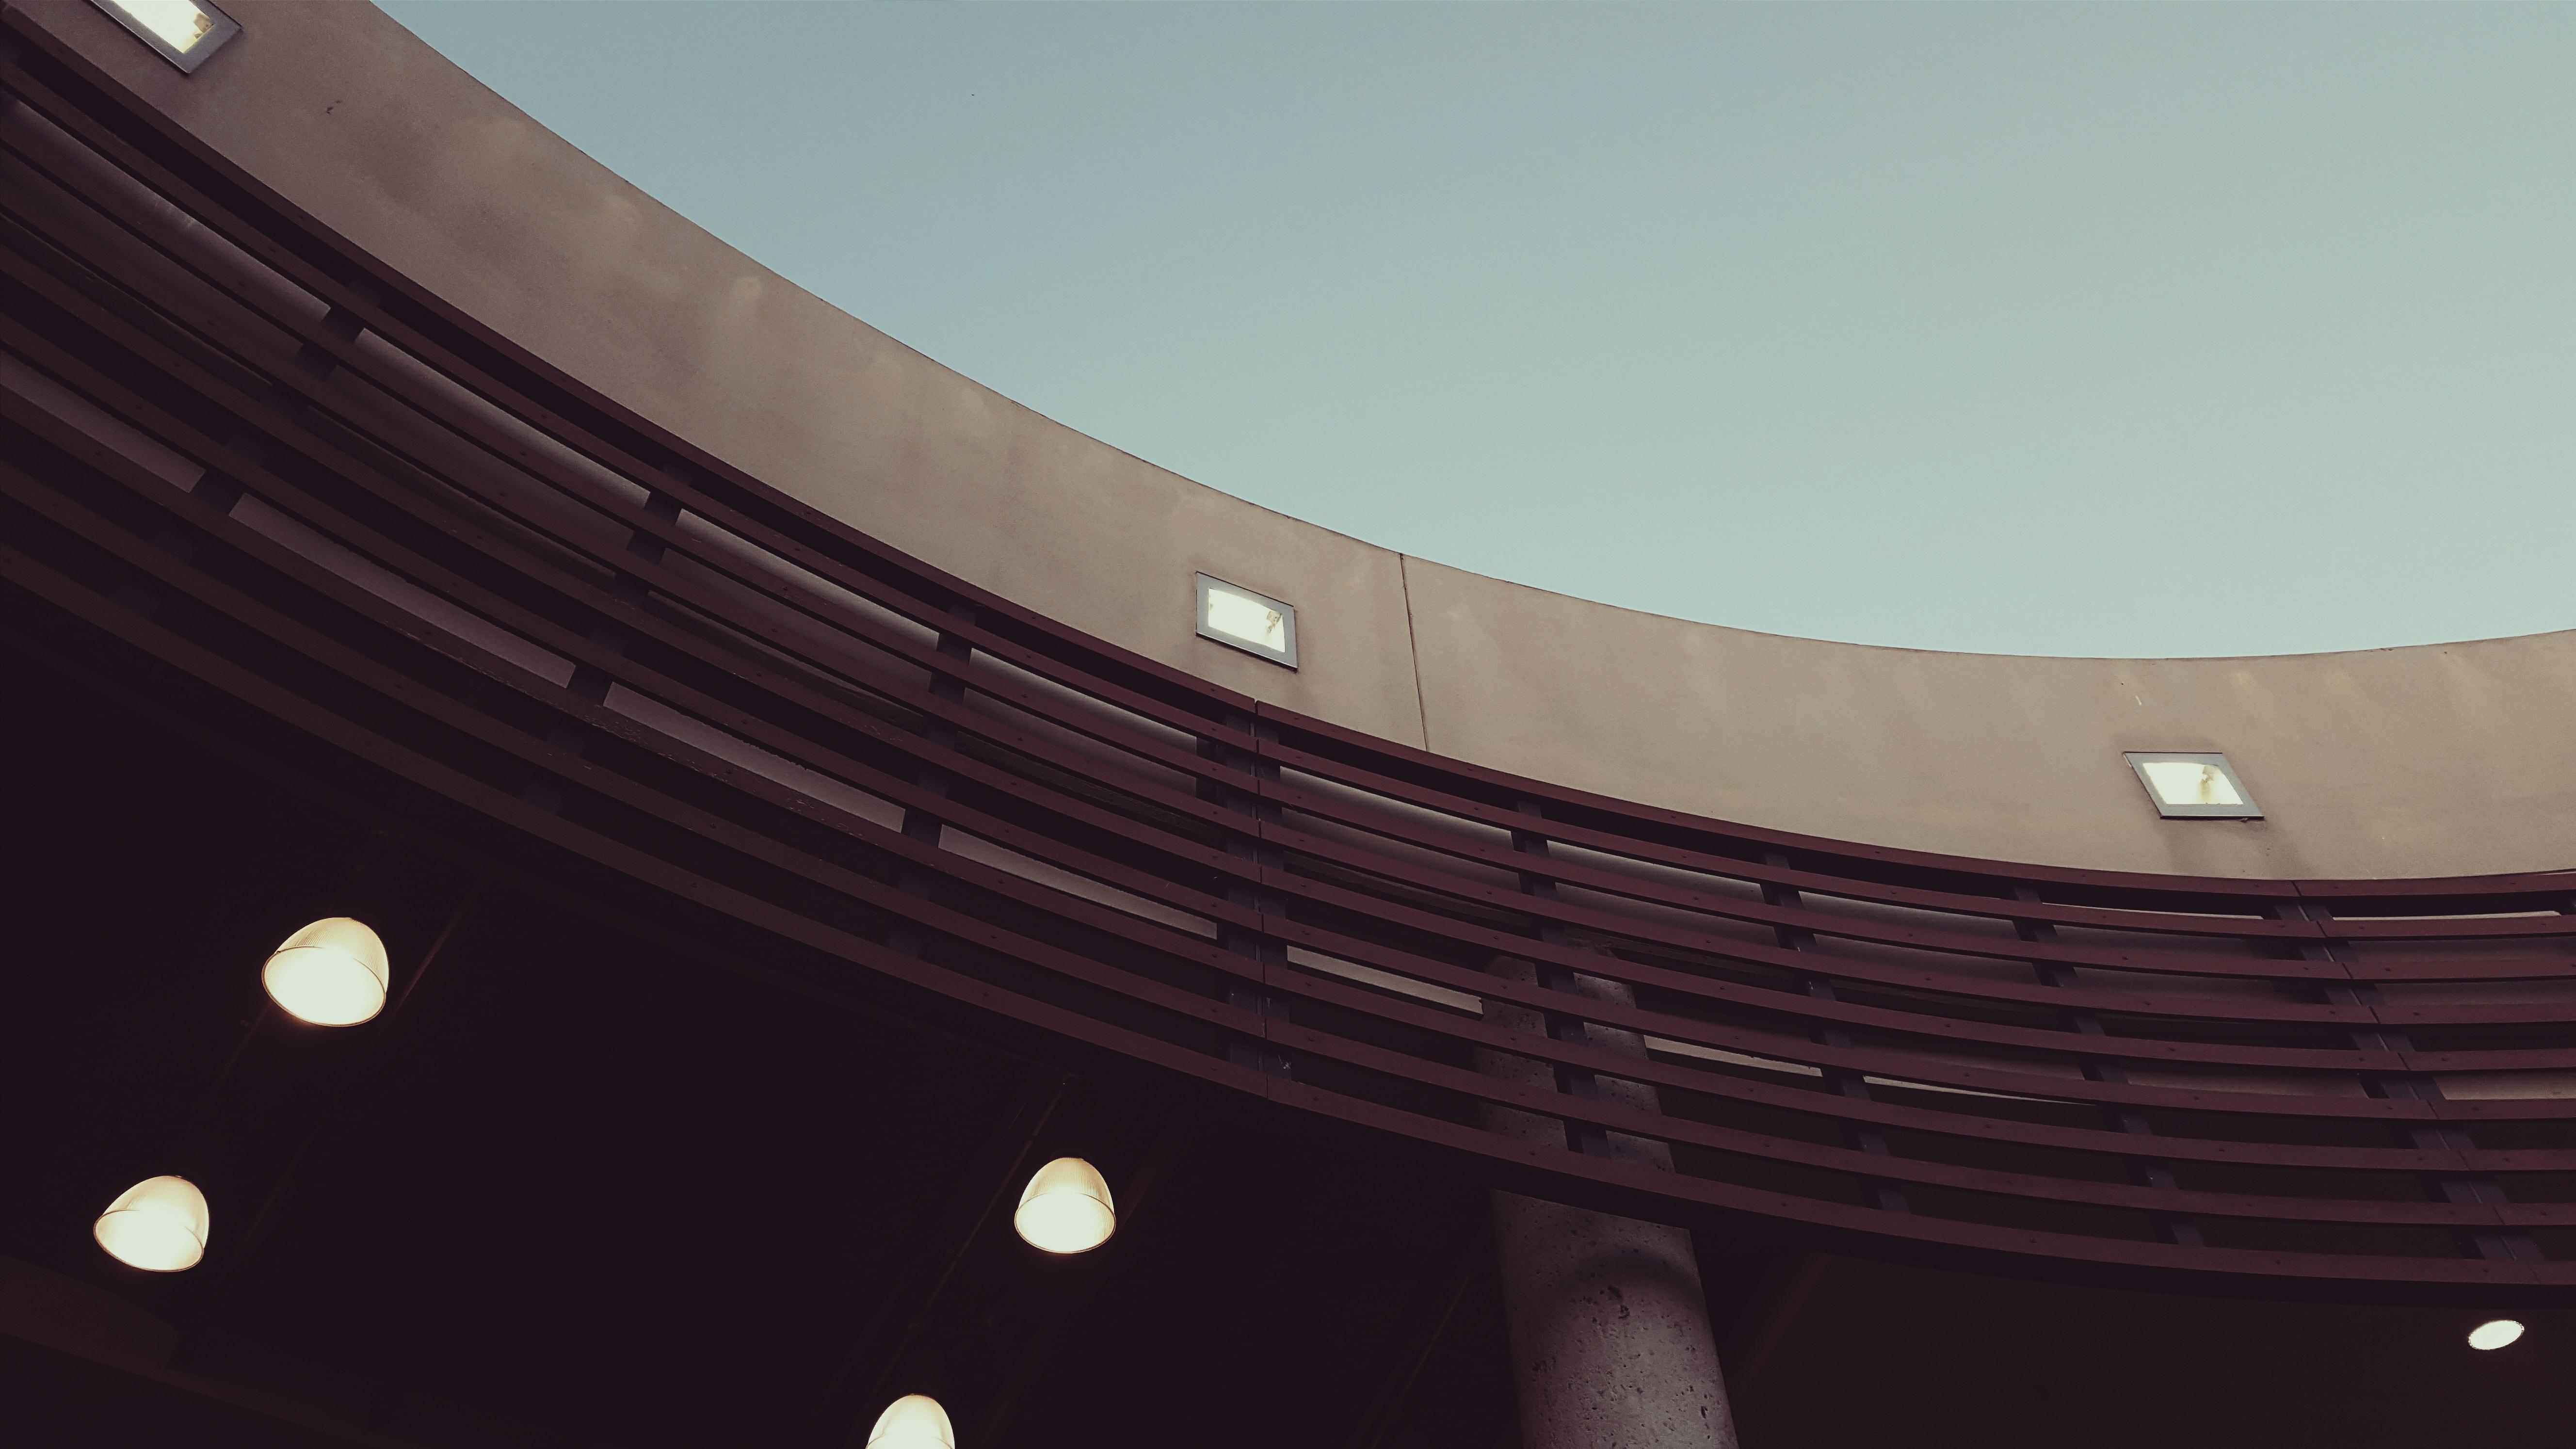 grey concrete structure